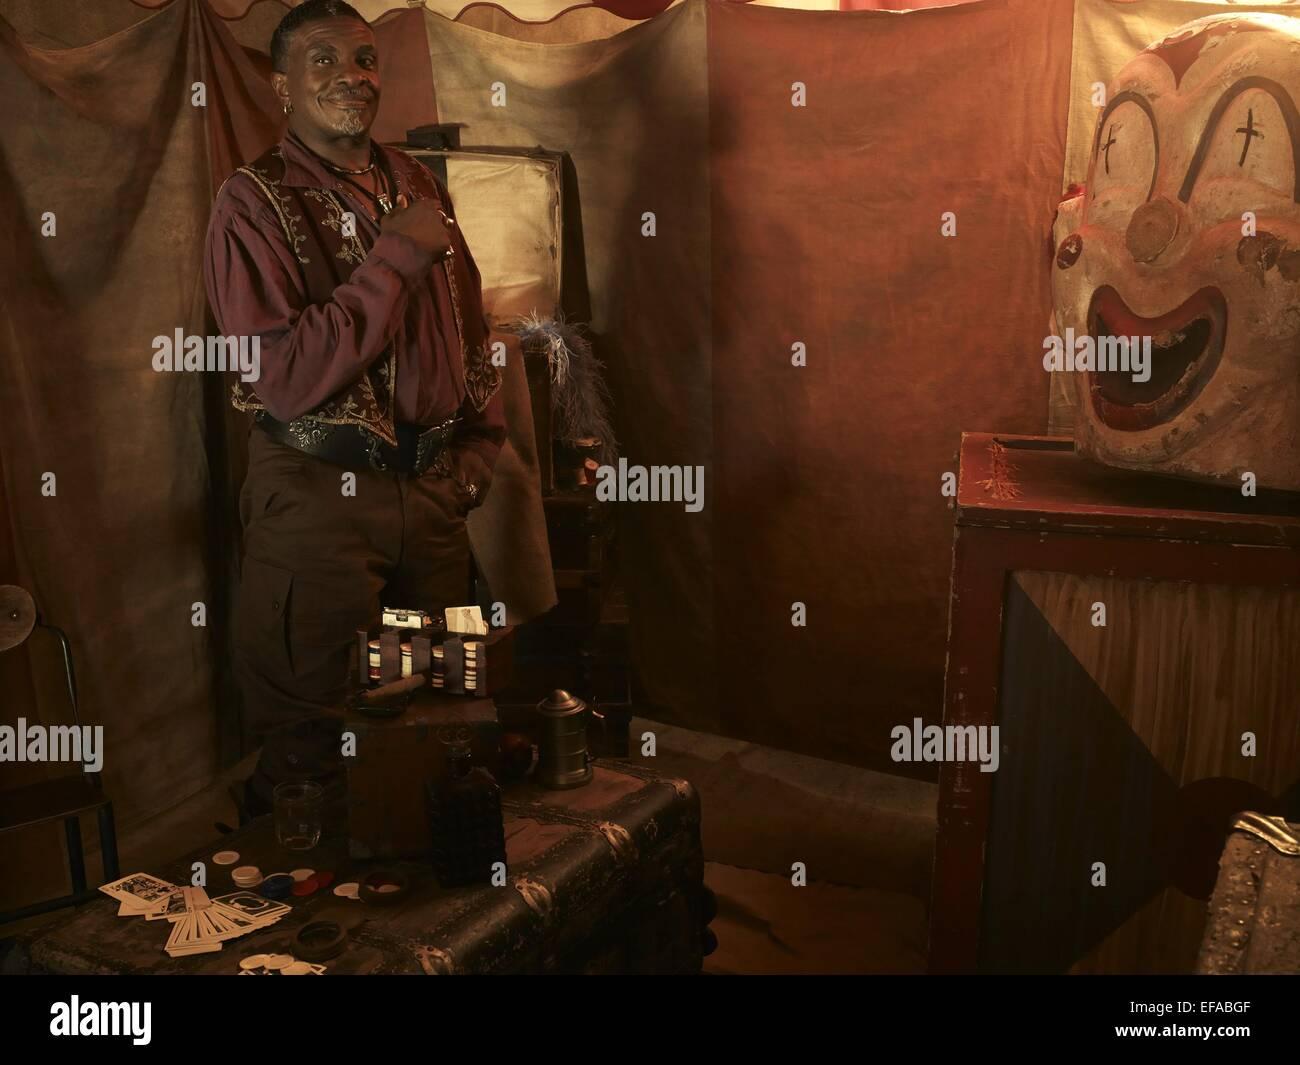 KEITH DAVID THE CAPE (2011) - Stock Image